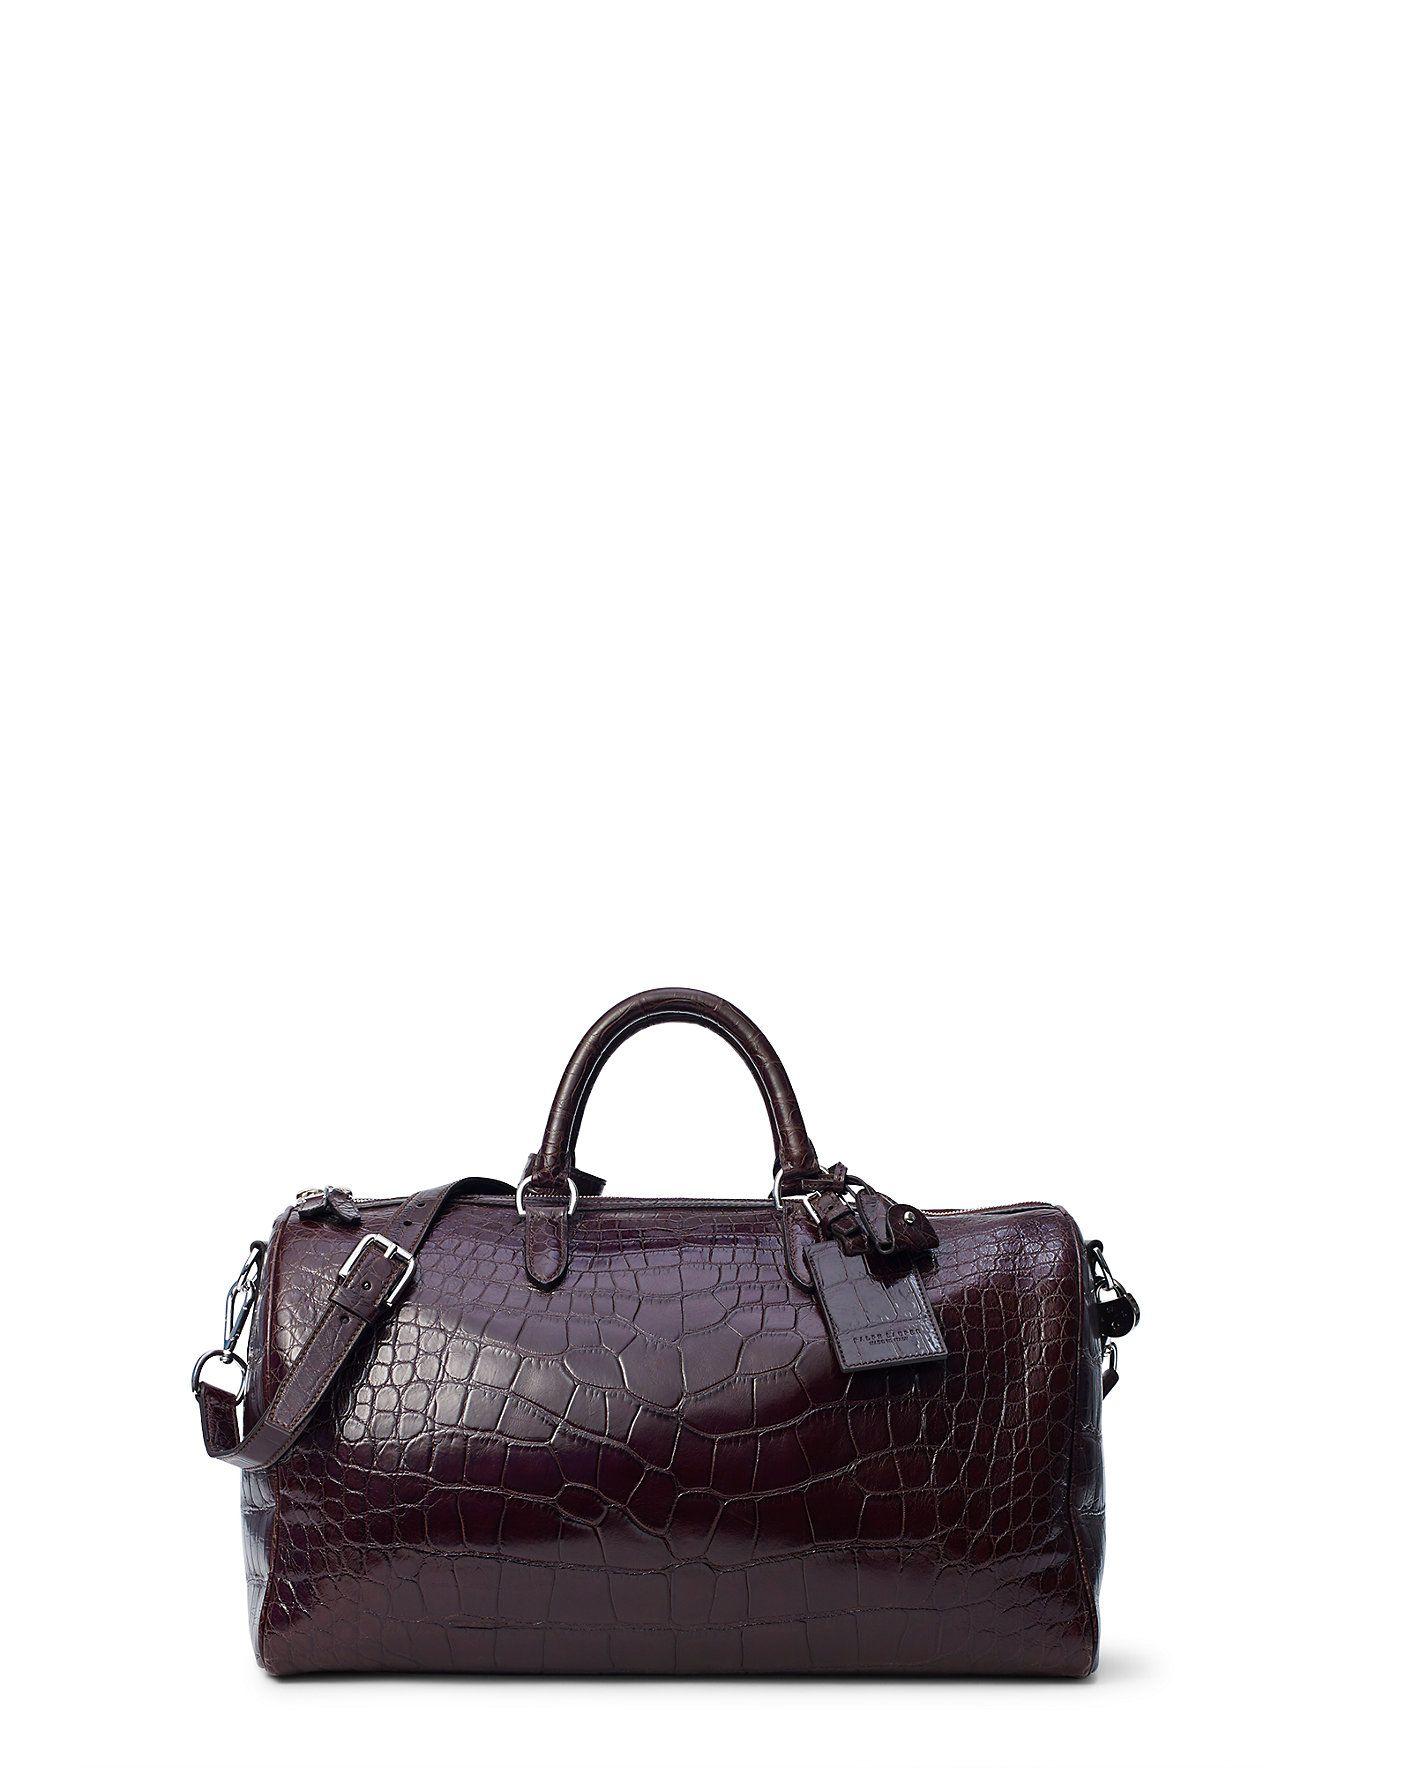 7184247c5bfc Ralph Lauren Boston Alligator Bag